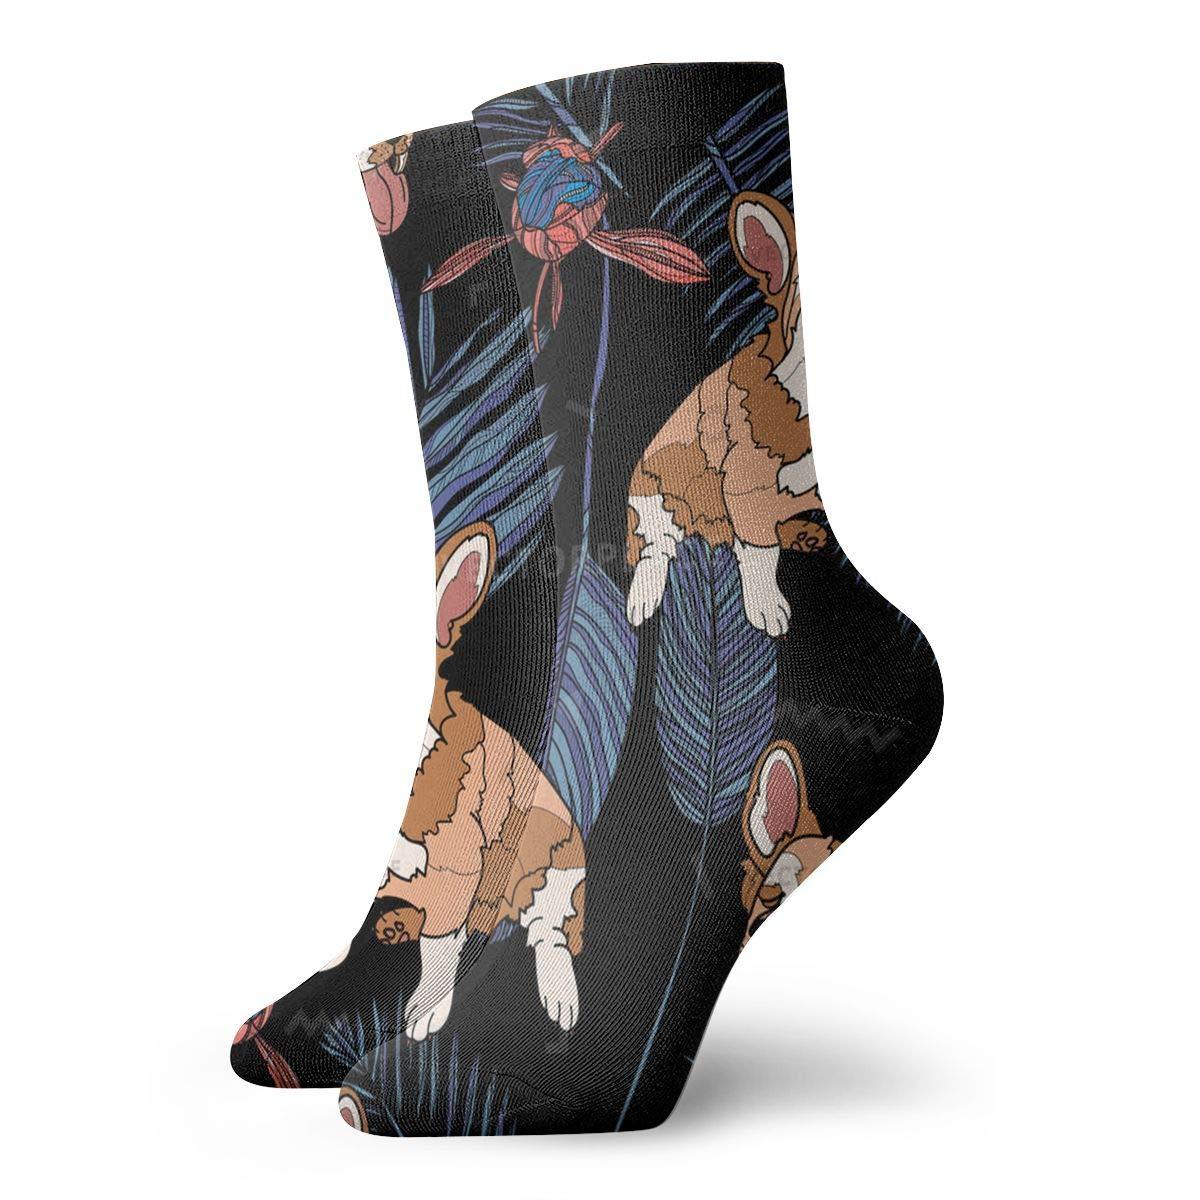 Dogs Unisex Funny Casual Crew Socks Athletic Socks For Boys Girls Kids Teenagers